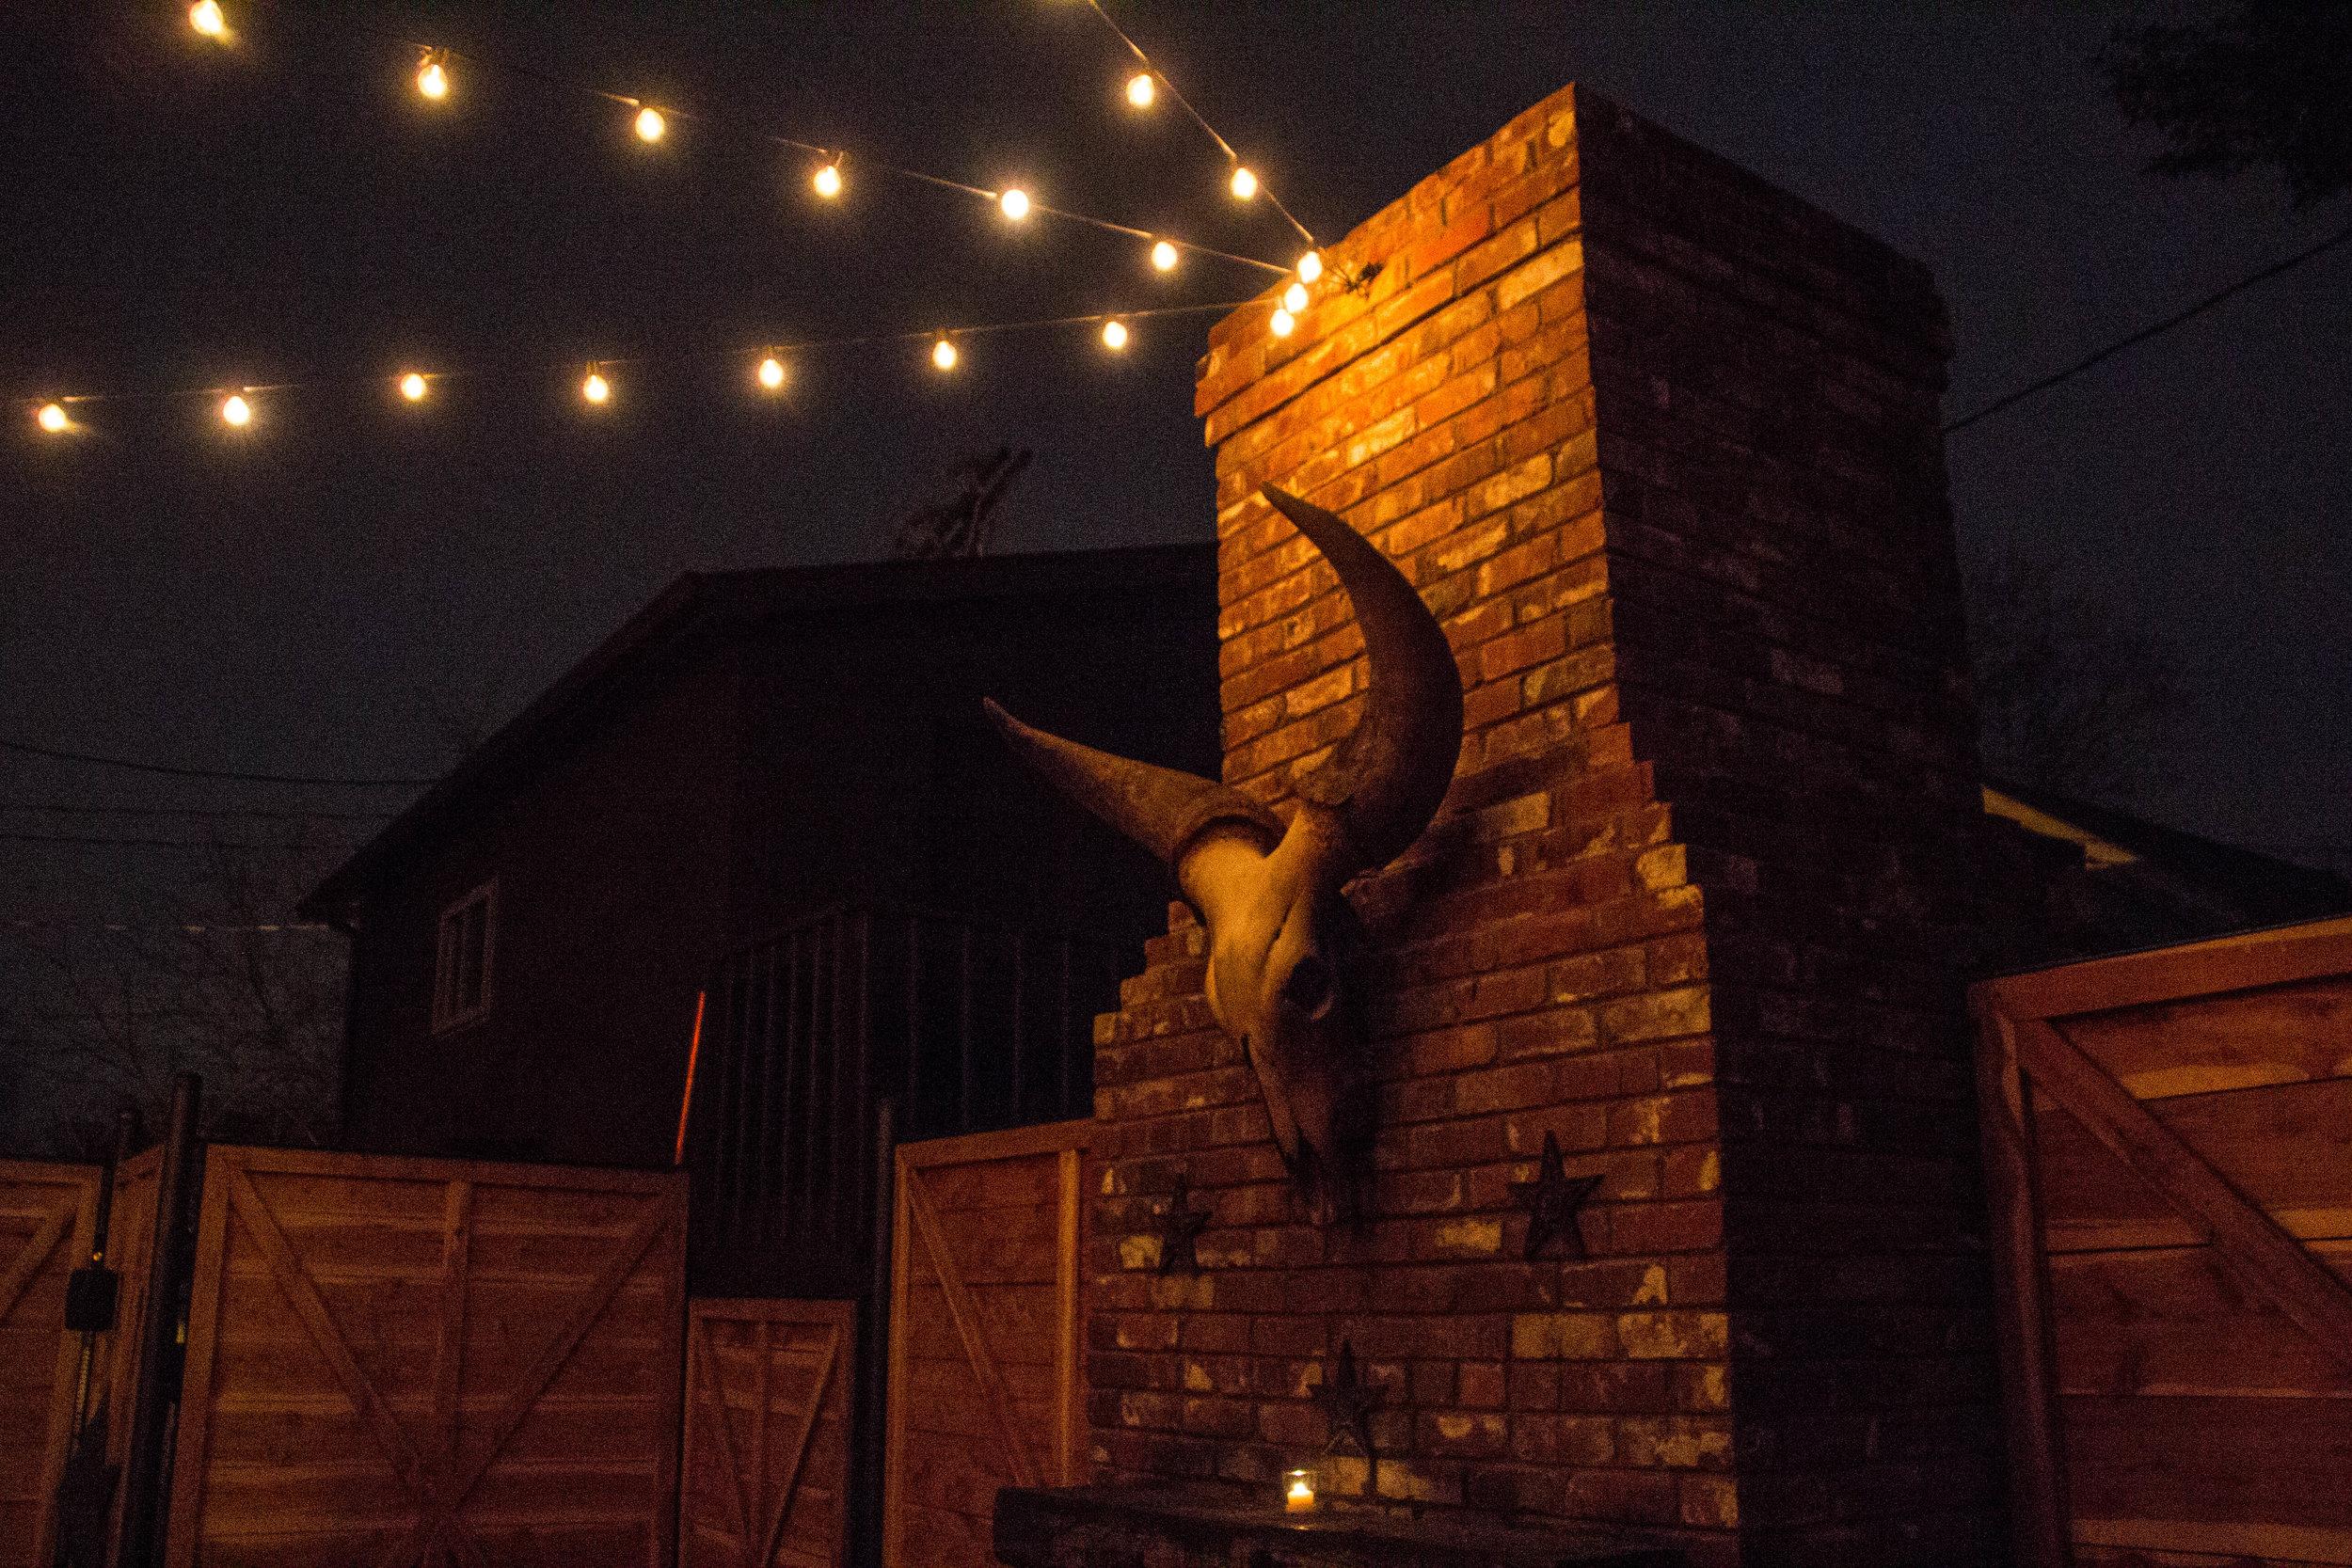 Urban Cowboy East Nashville Nightlife-1-3.jpg